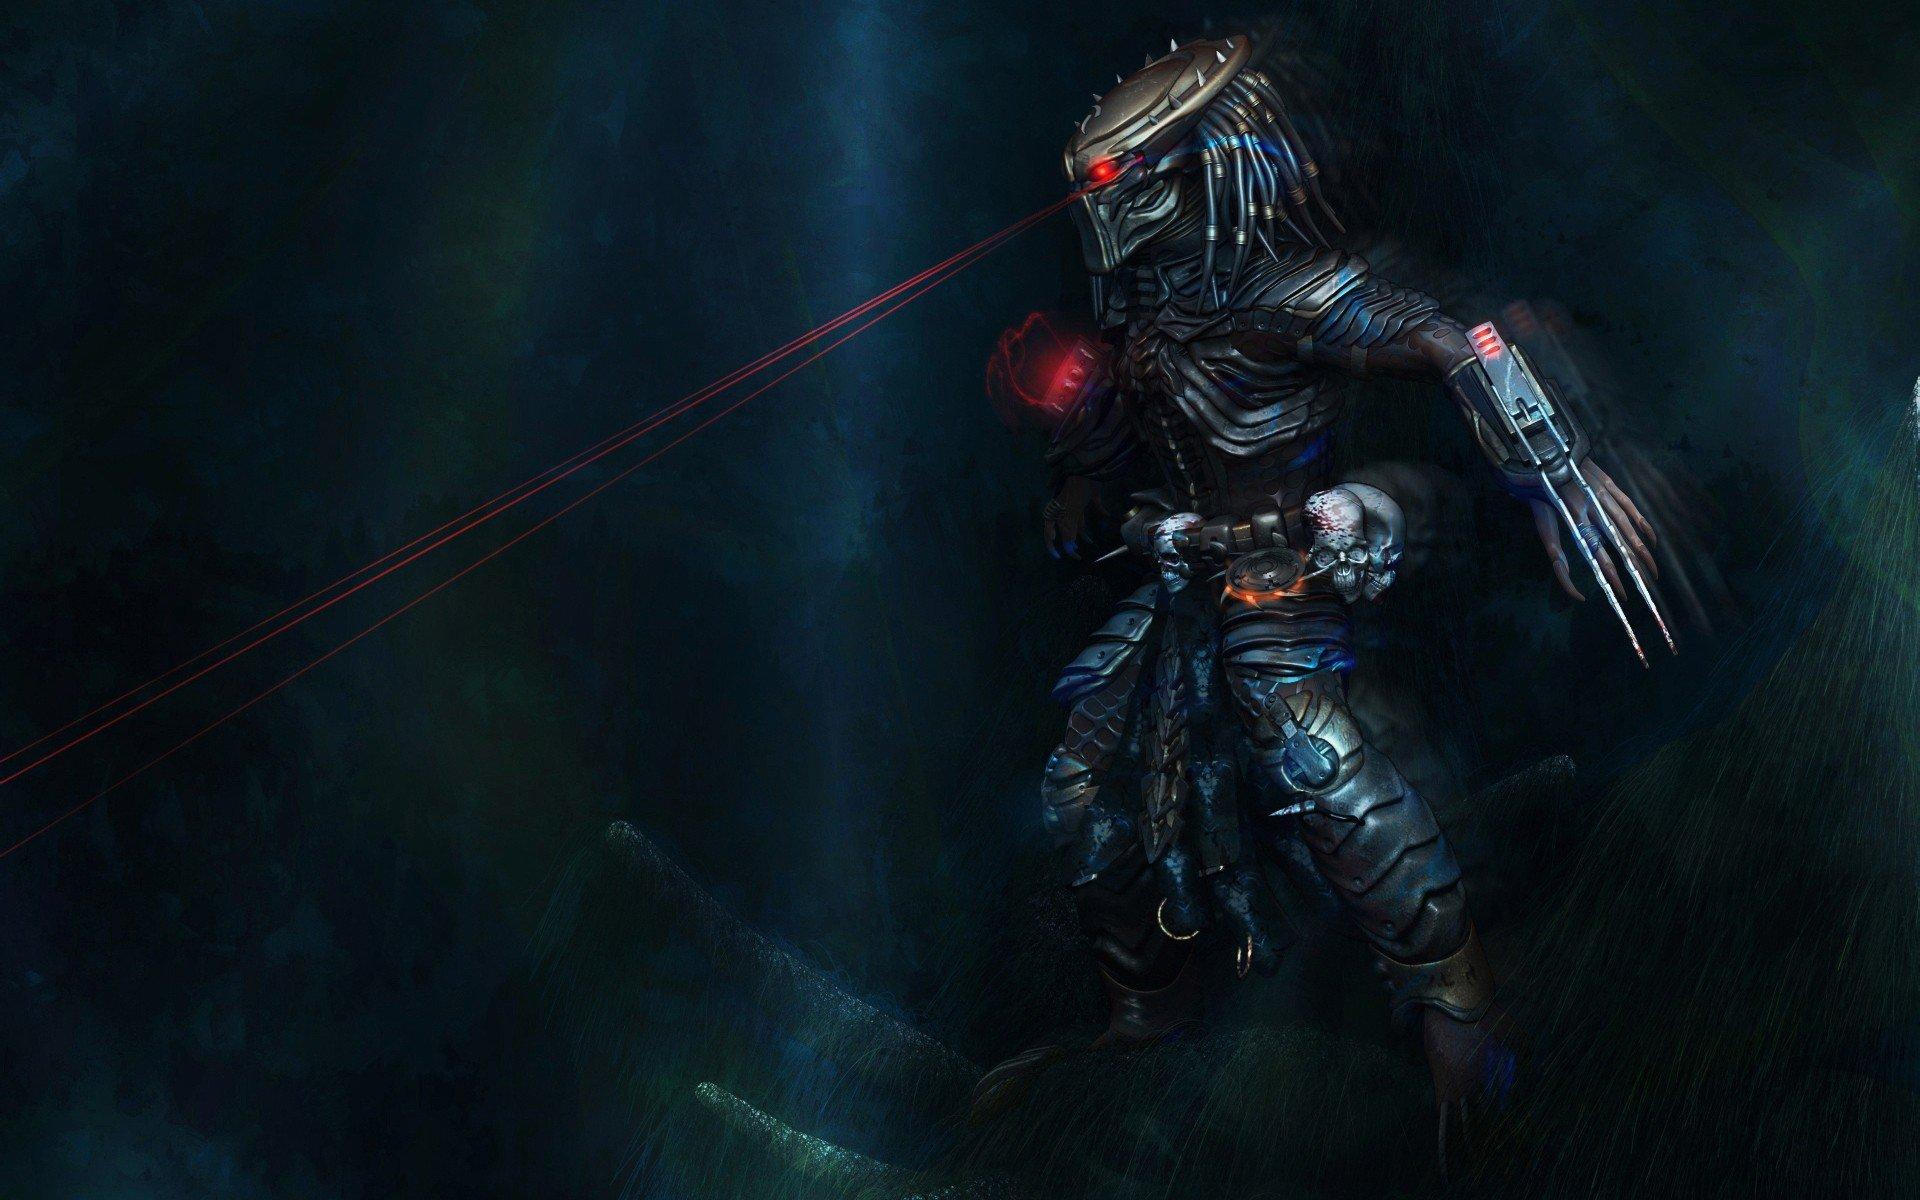 Skulls movies monsters predator creatures science fiction ...